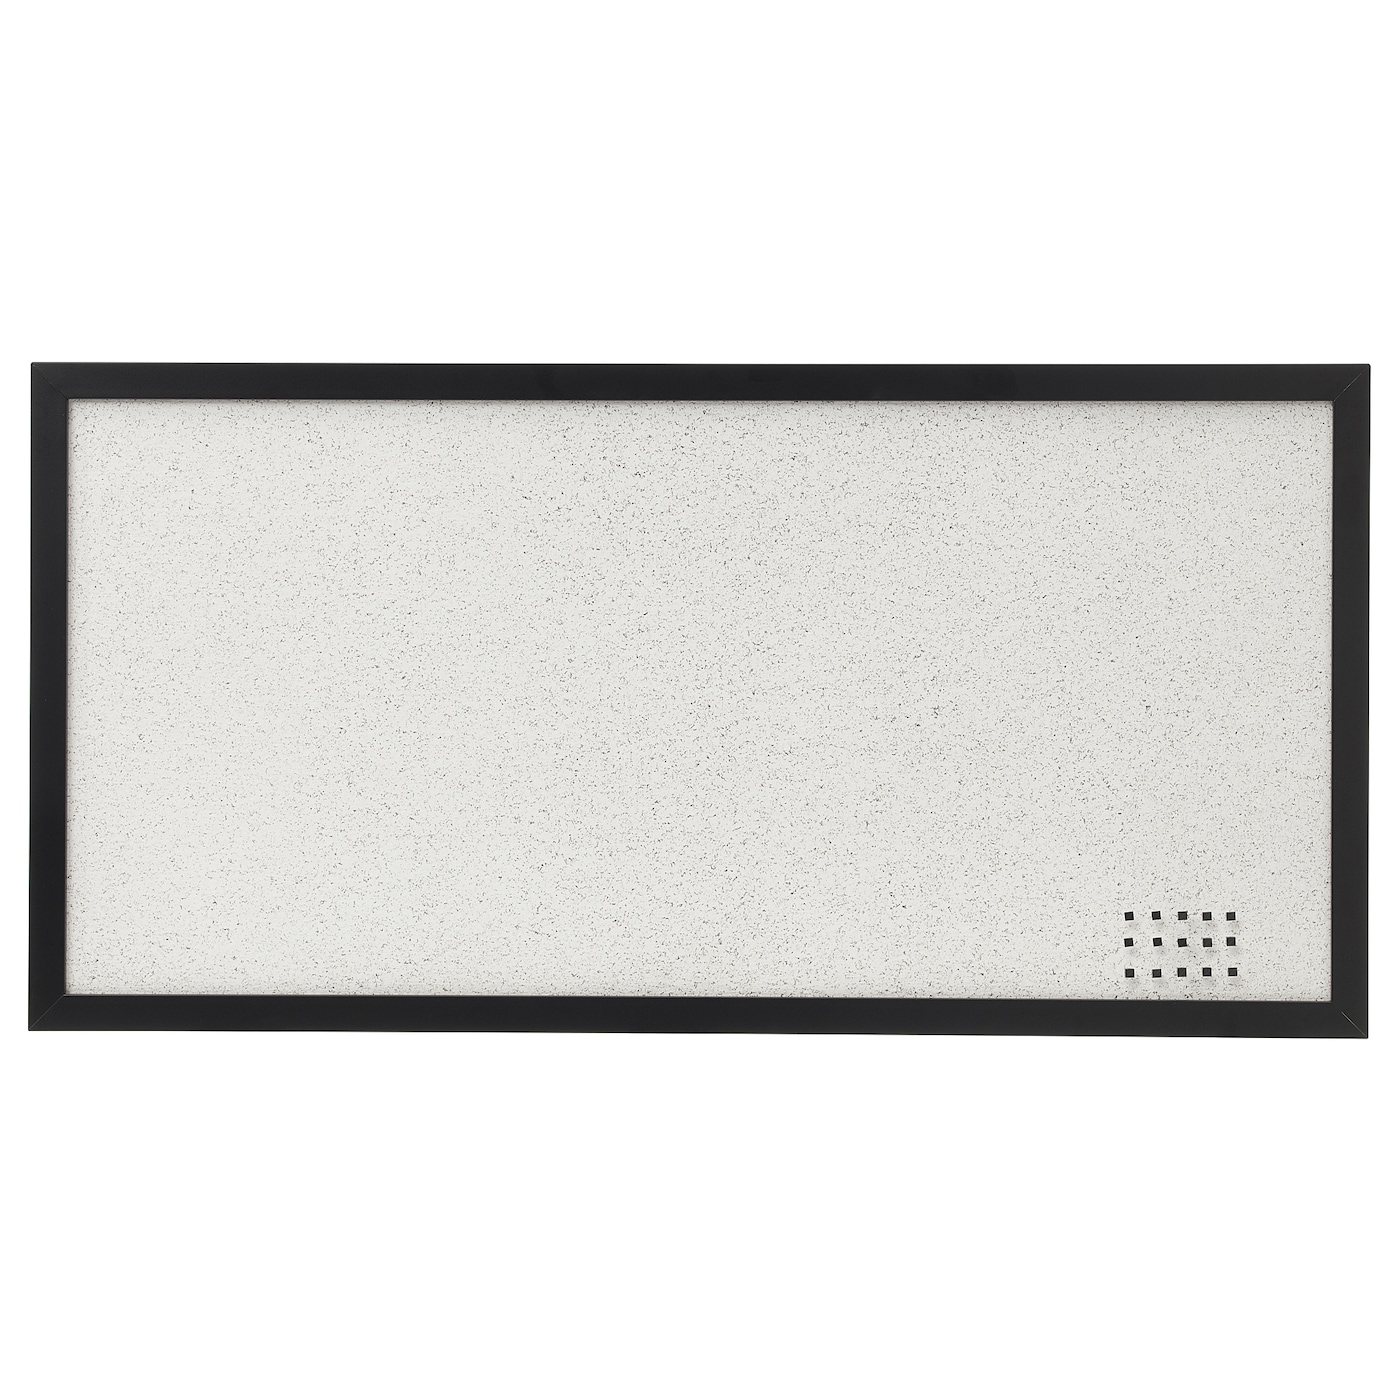 whiteboard notice boards ikea. Black Bedroom Furniture Sets. Home Design Ideas